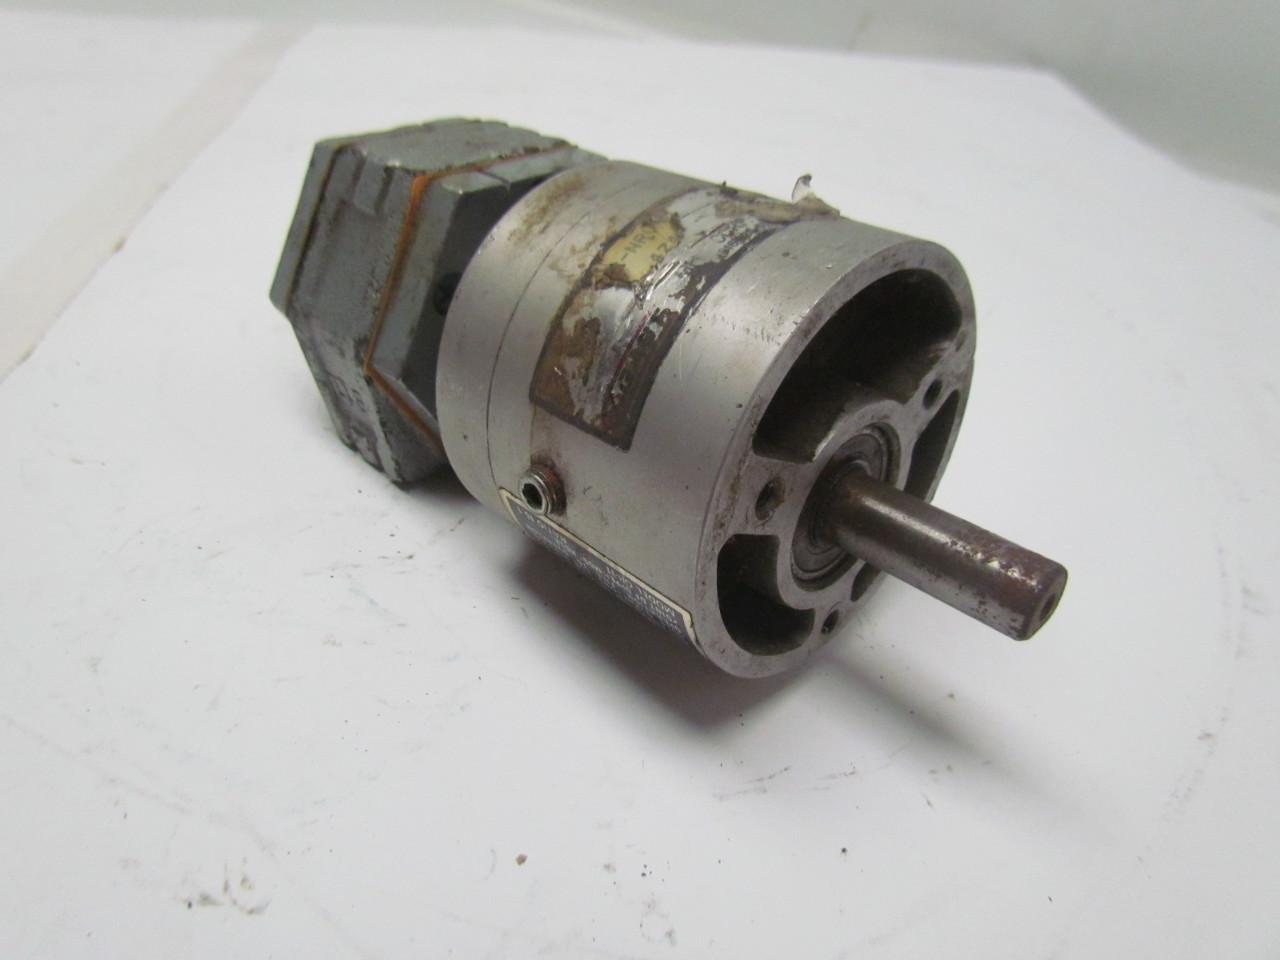 Gast 1up nrv air powered gear motor w gr 11 ratio 15 1 for Air powered gear motor